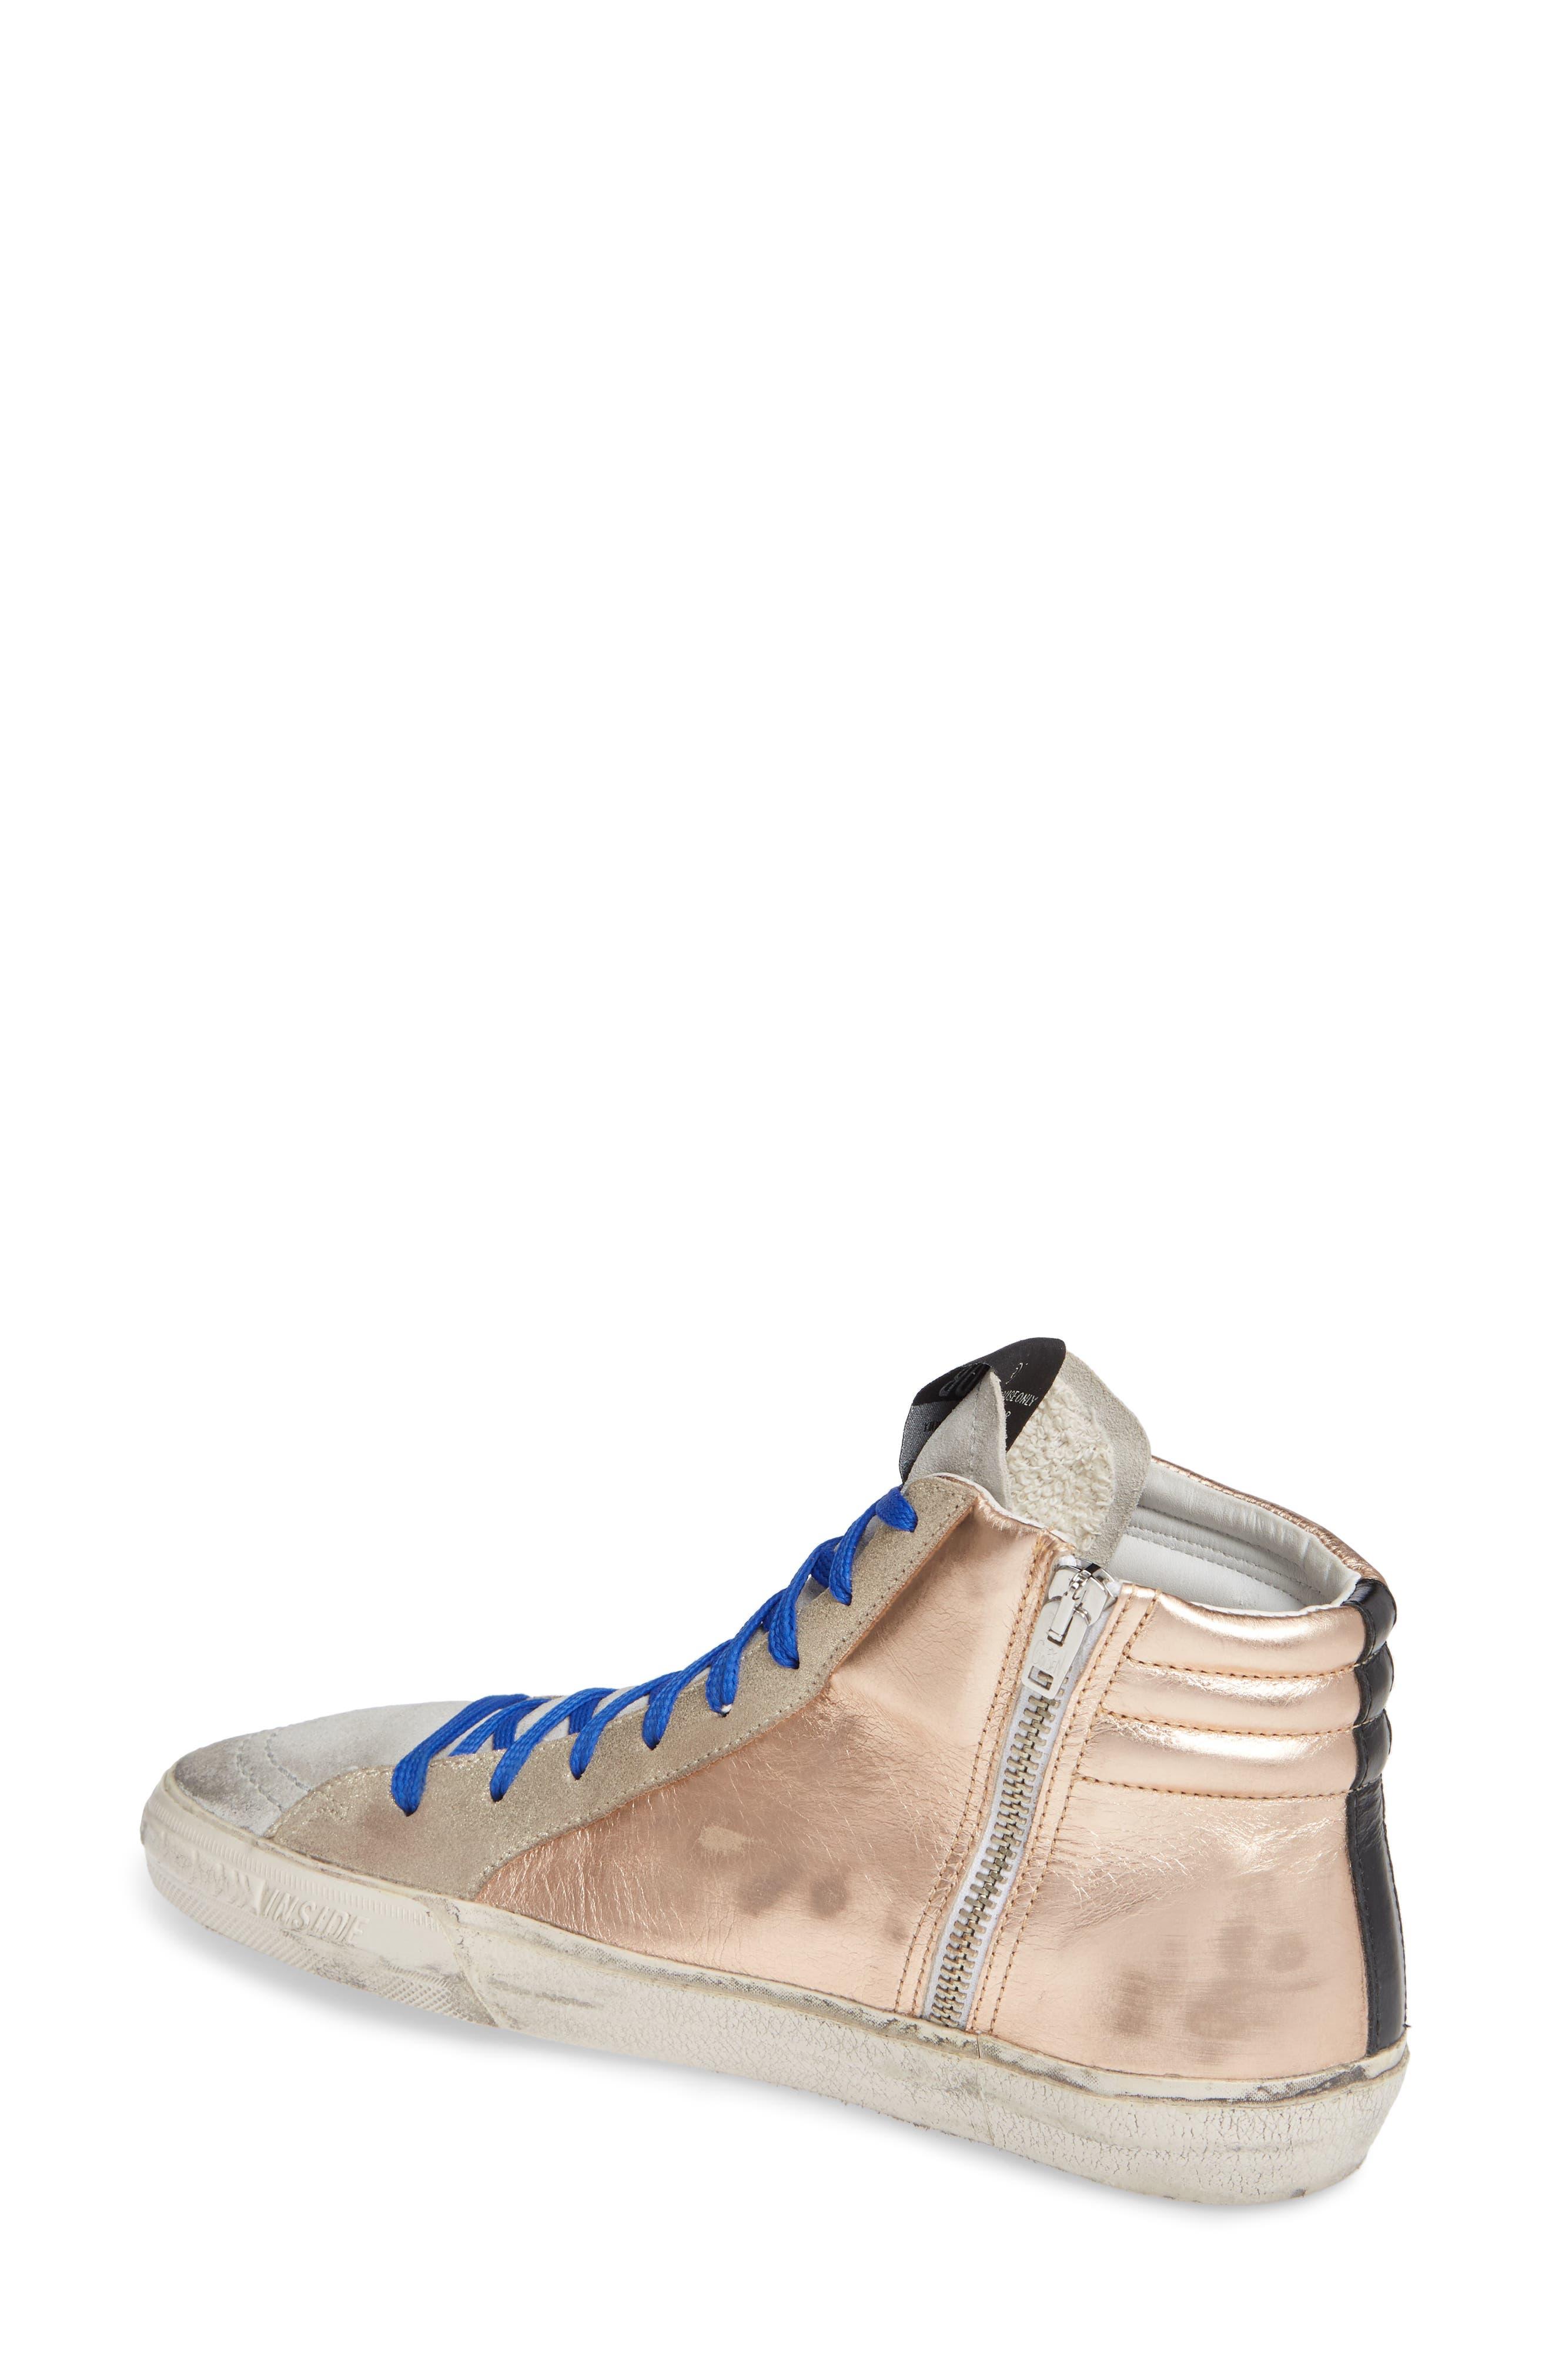 High Top Sneaker,                             Alternate thumbnail 2, color,                             ROSE GOLD/ GREY